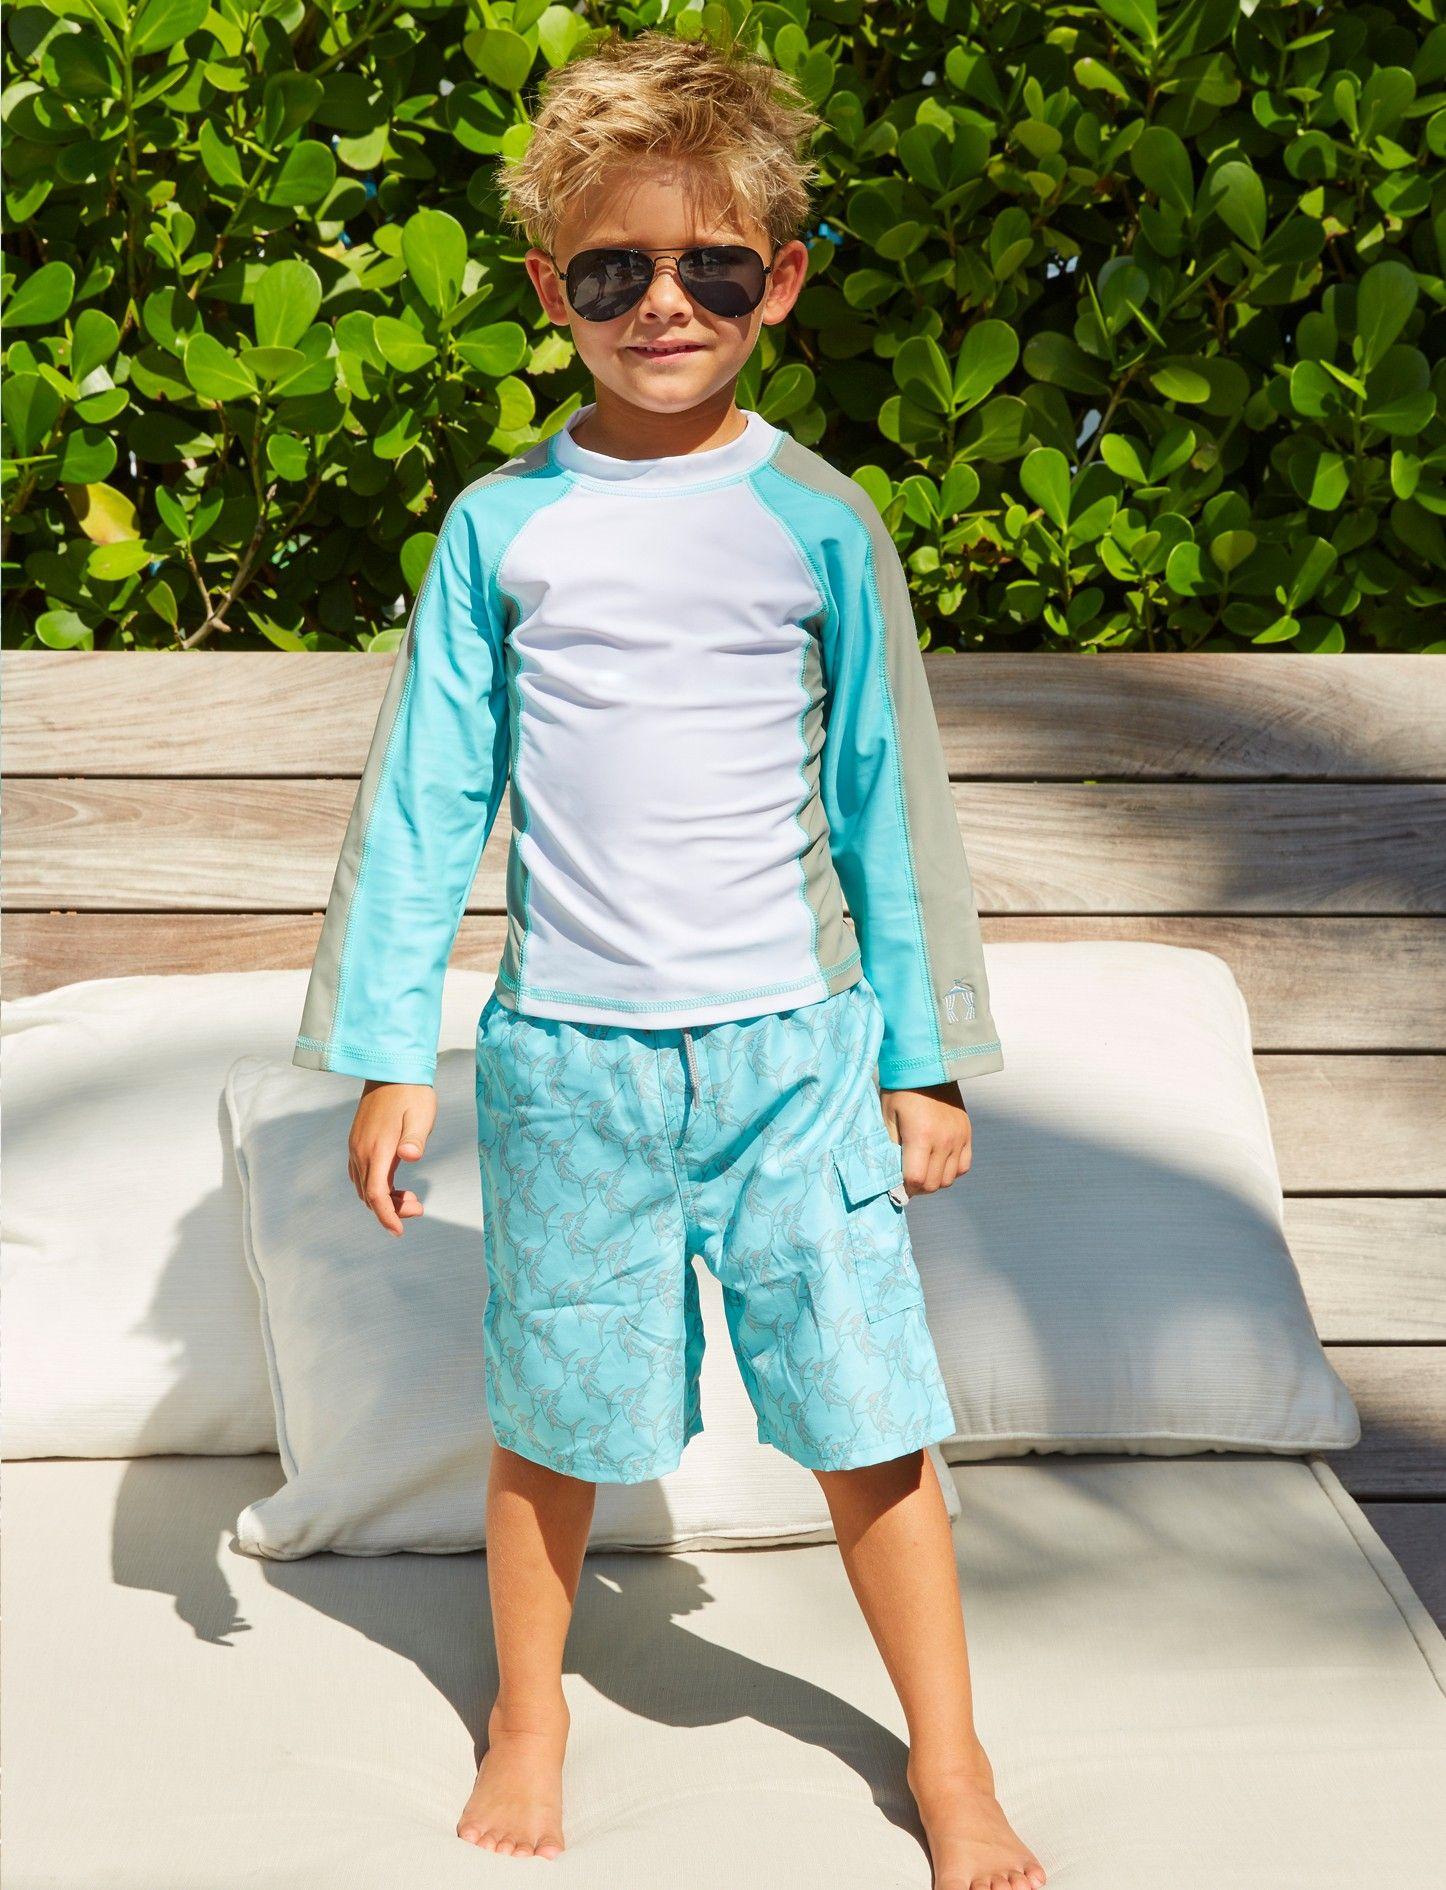 db0f9596a9 Little Boys Grey Swordfish Rashguard Set, 50+UPF Sun Protective Clothing,  Cabana Life